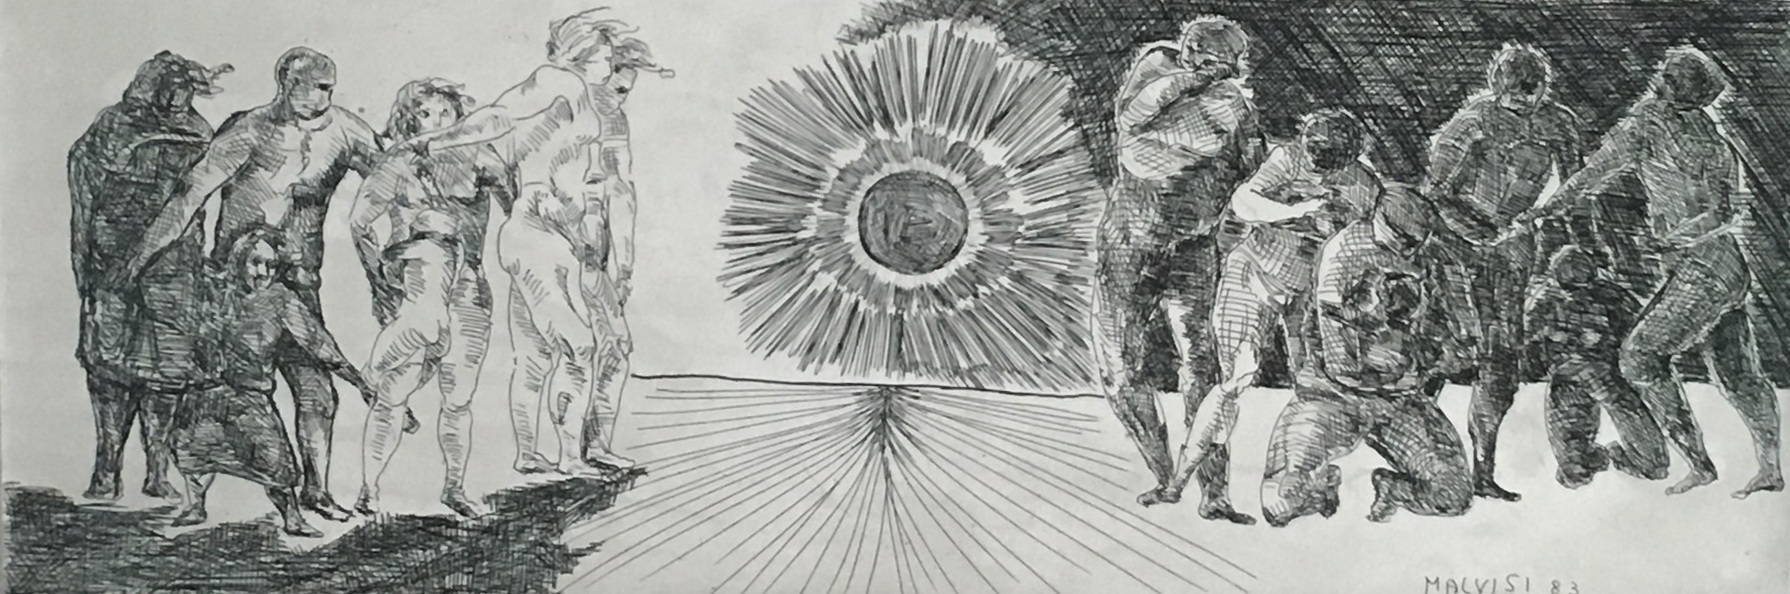 <b>Coveted torment of light</b><br> (Orig.Agognato tormento di luce) <br> 1987 Etching acquatint, cm 29 x 93